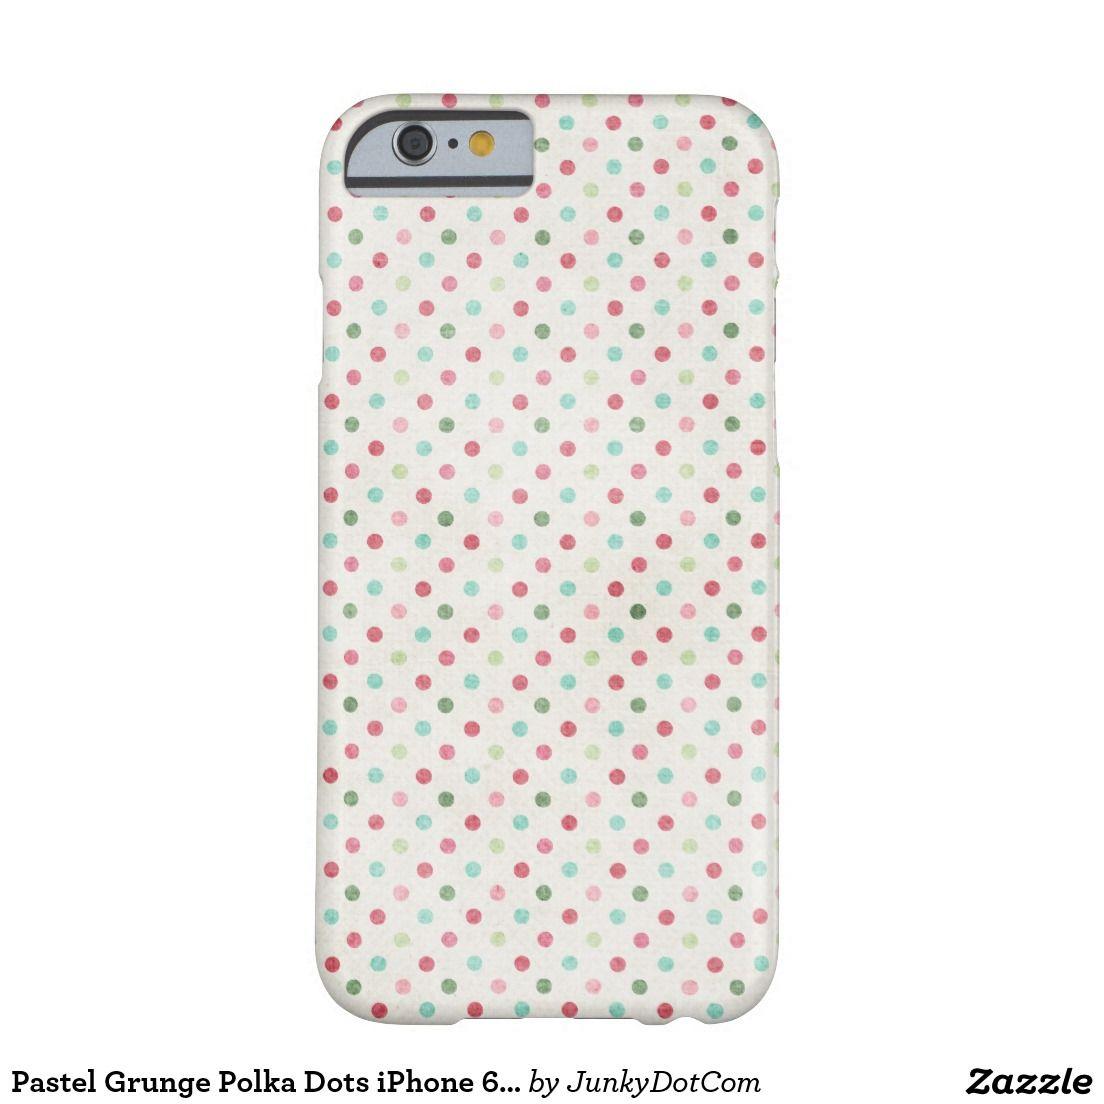 Pastel Grunge Polka Dots iPhone 6 case - Sept 27